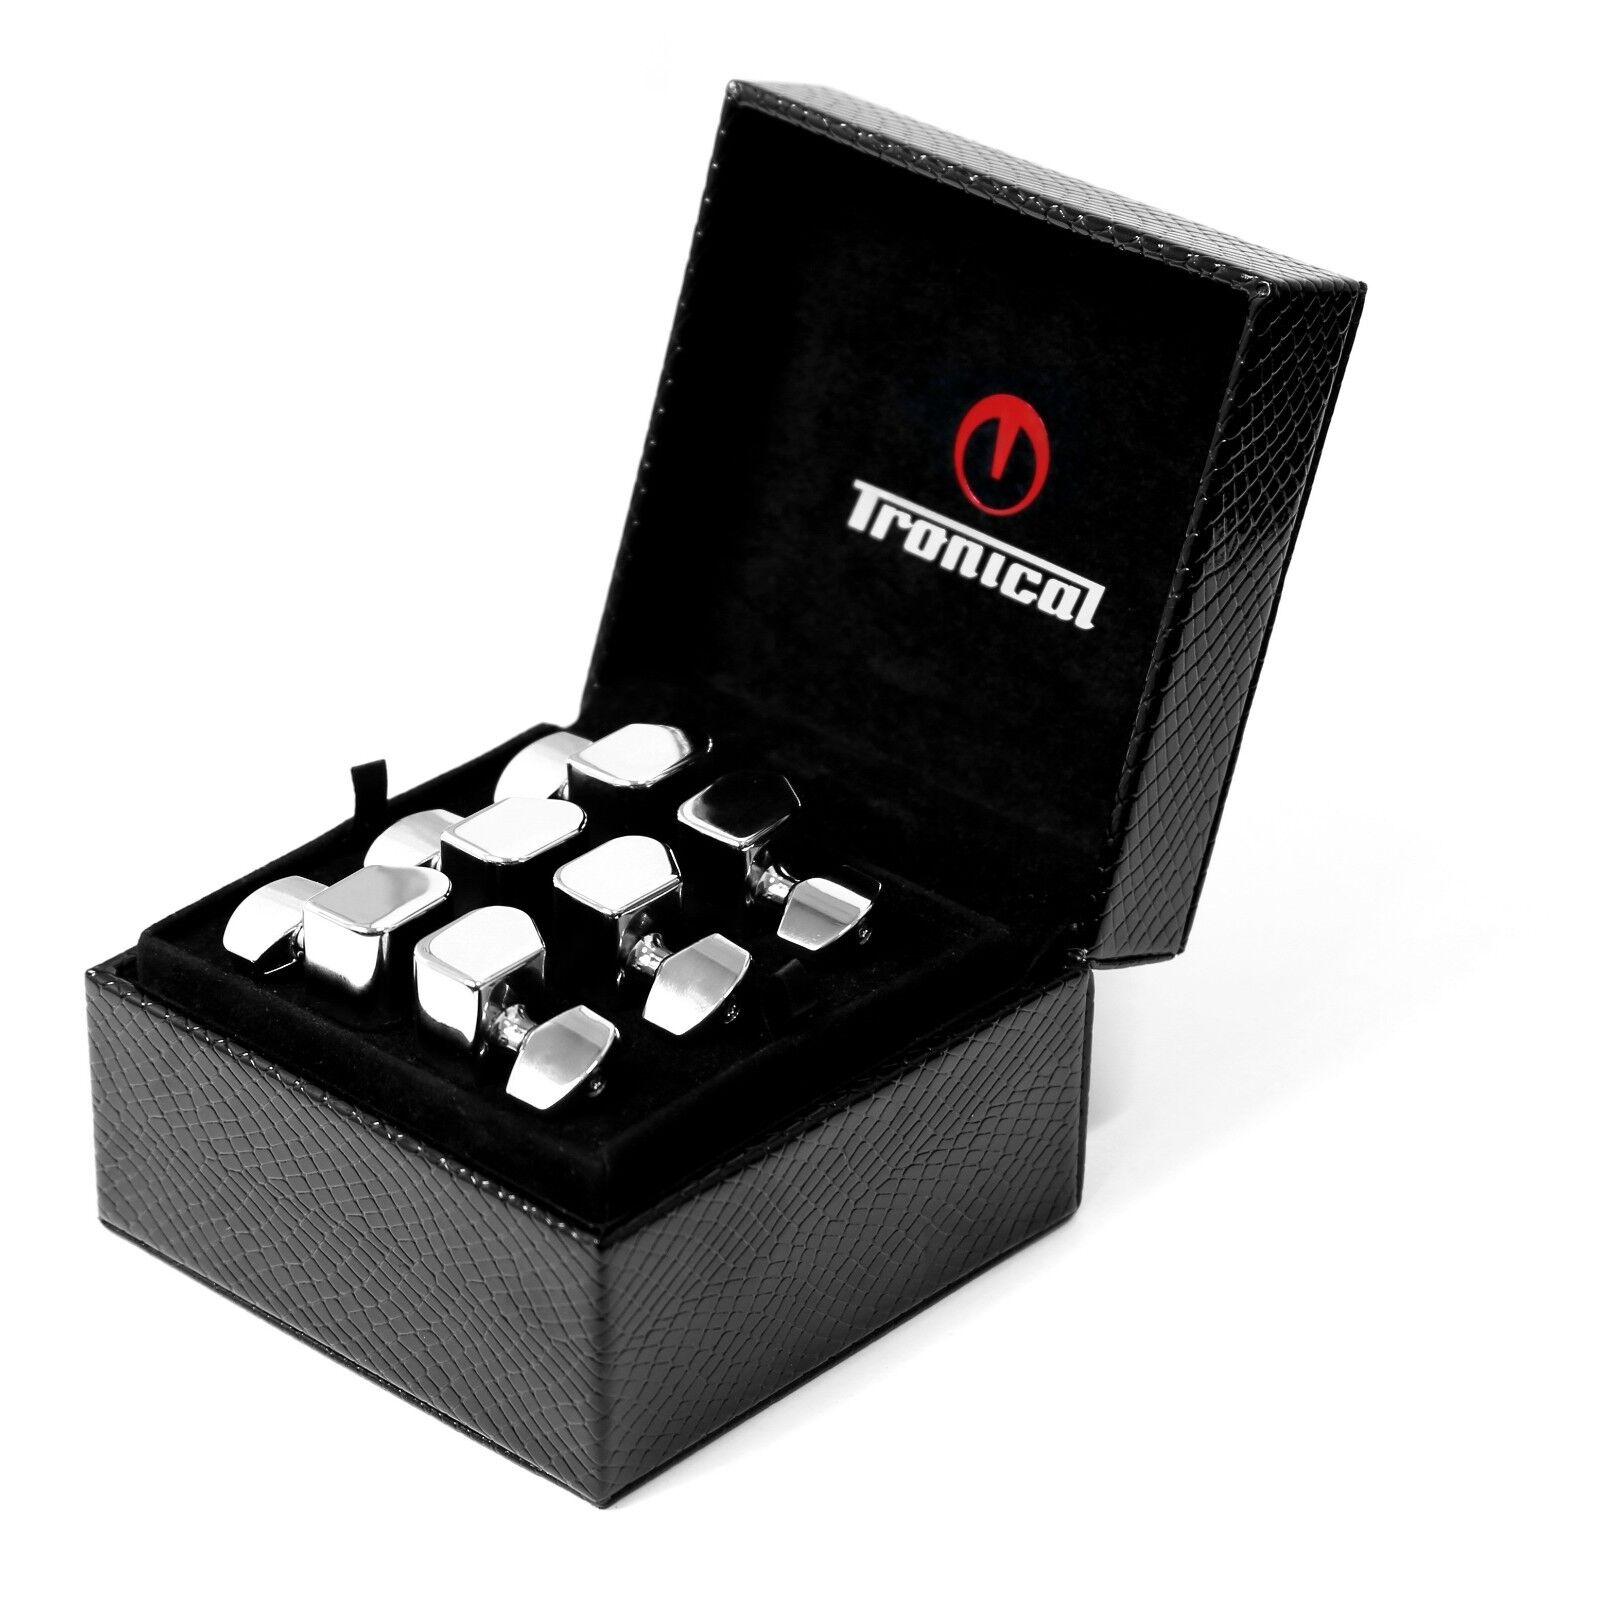 Tronical Robohead Set Chrome Strat 3+3 New in Box